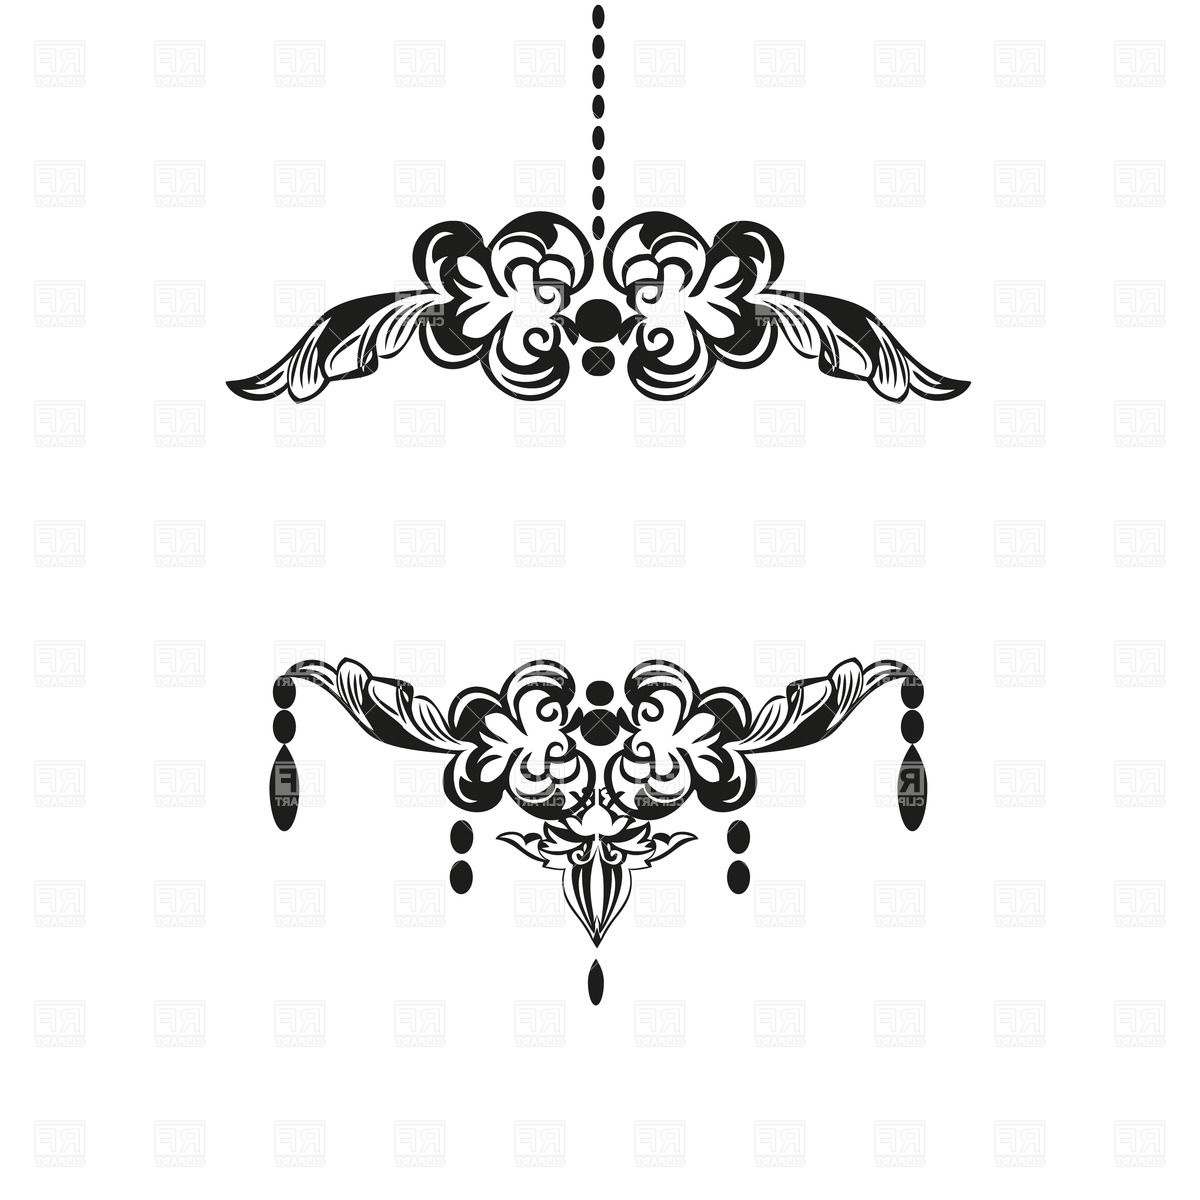 Vintage Black Chandelier Intended For Most Popular Black Vintage Chandelier Silhouette Royalty Free Vector Clip Art (View 14 of 20)